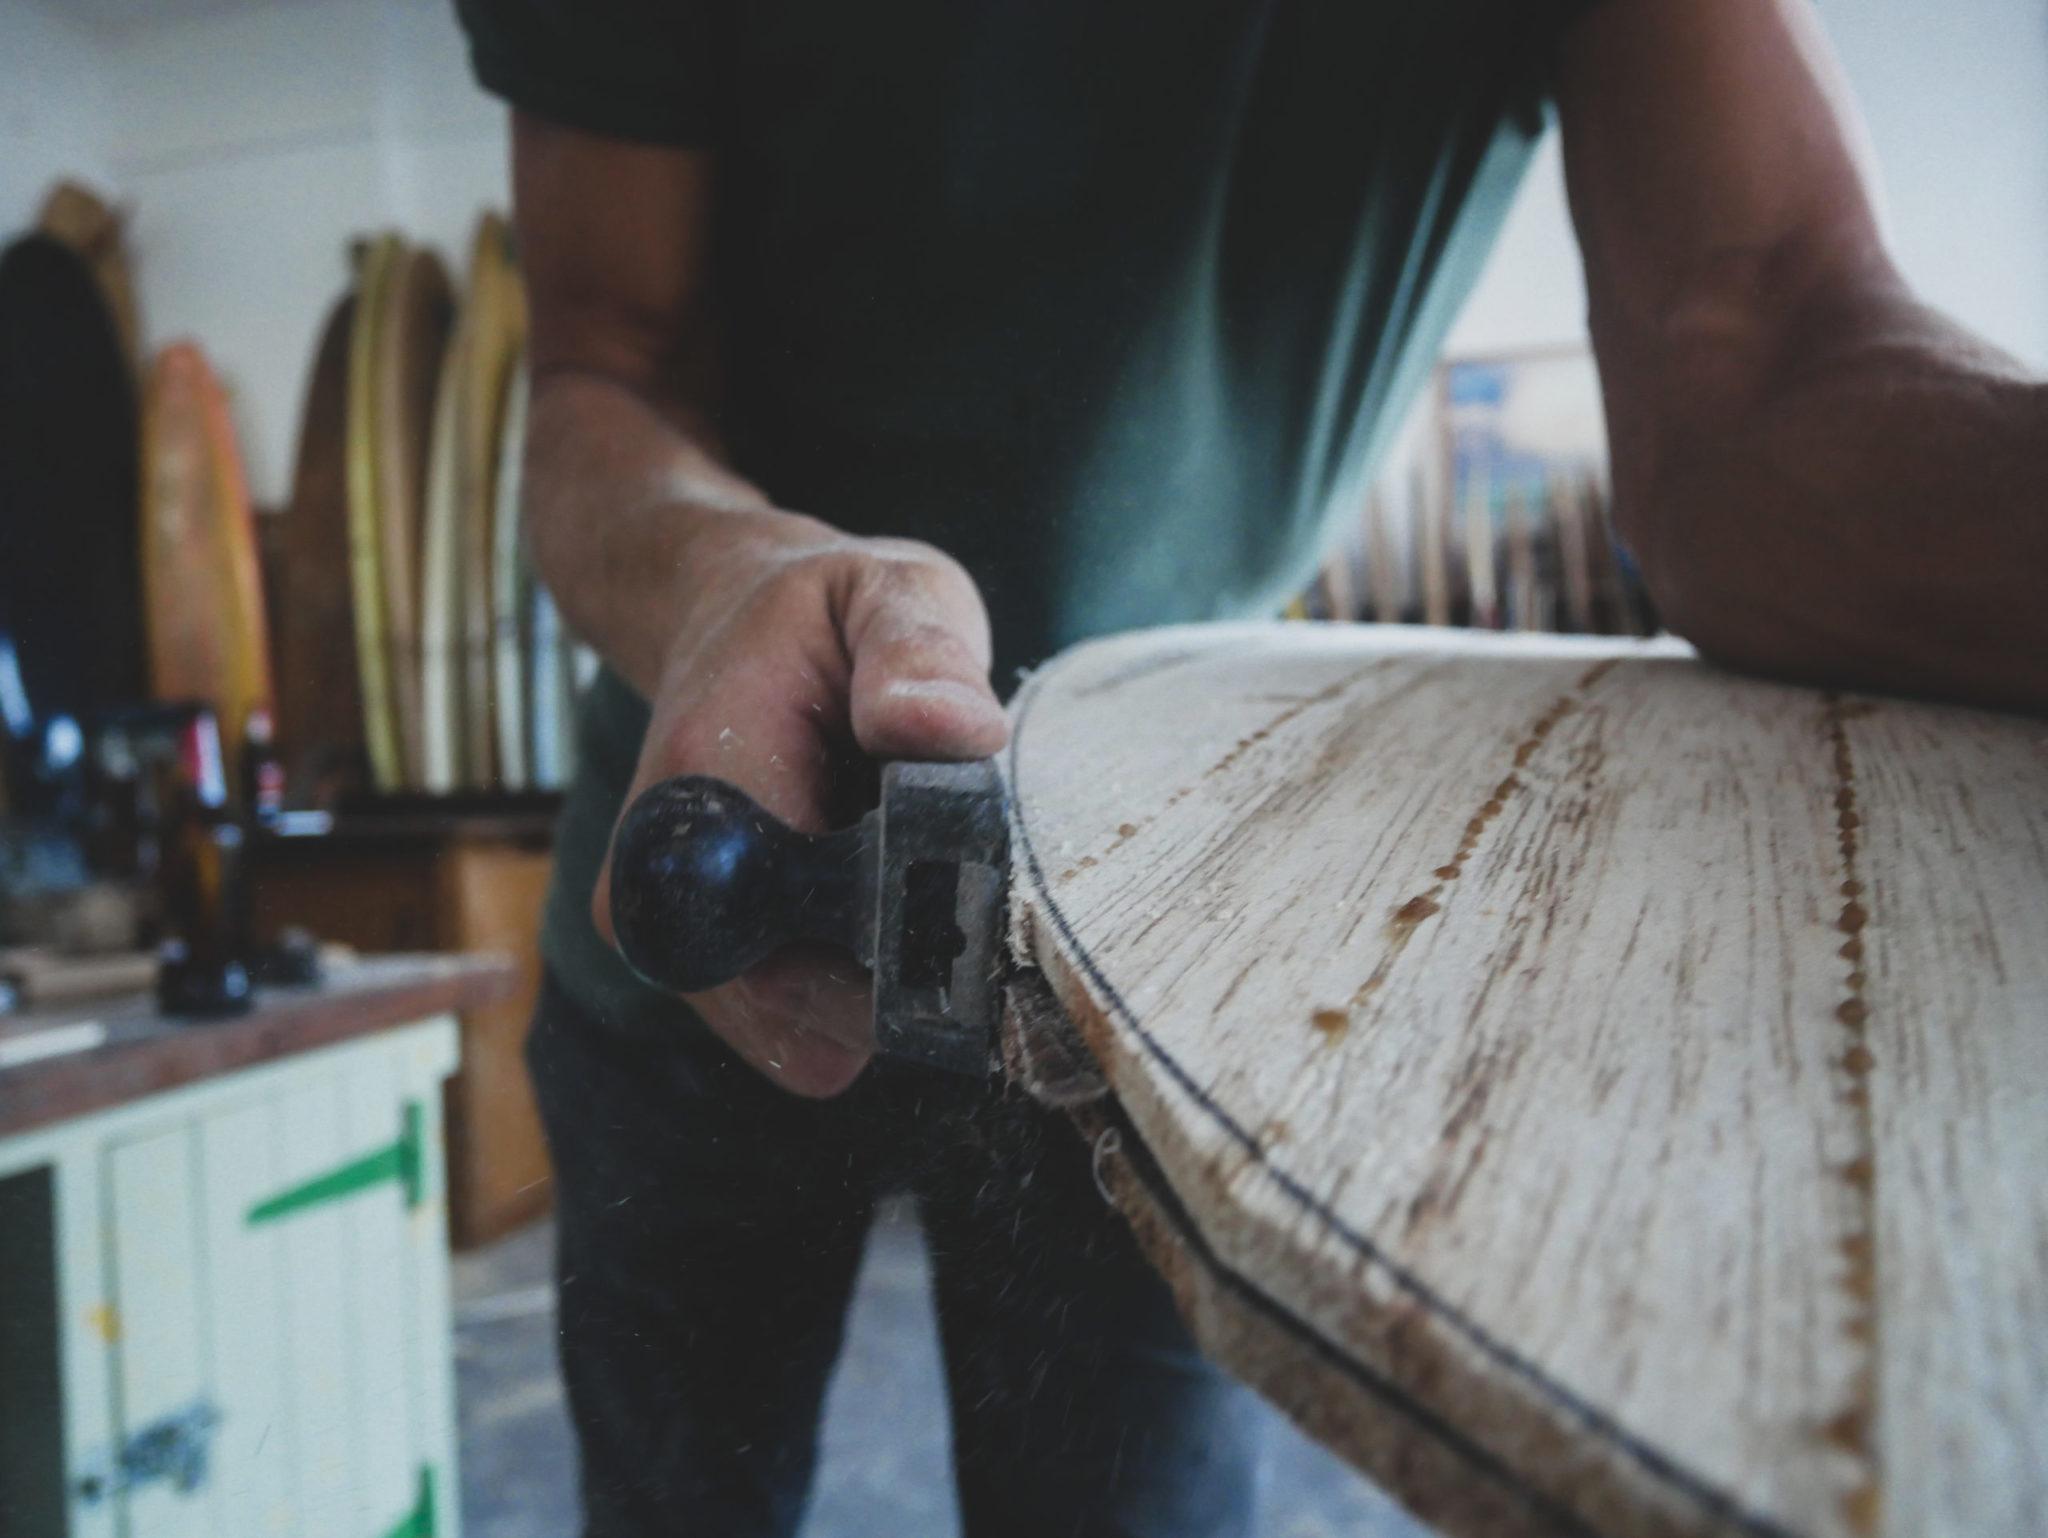 cachalot surfboards planche surf handmade artisan shaper hollow bois atelier shape julien mavier